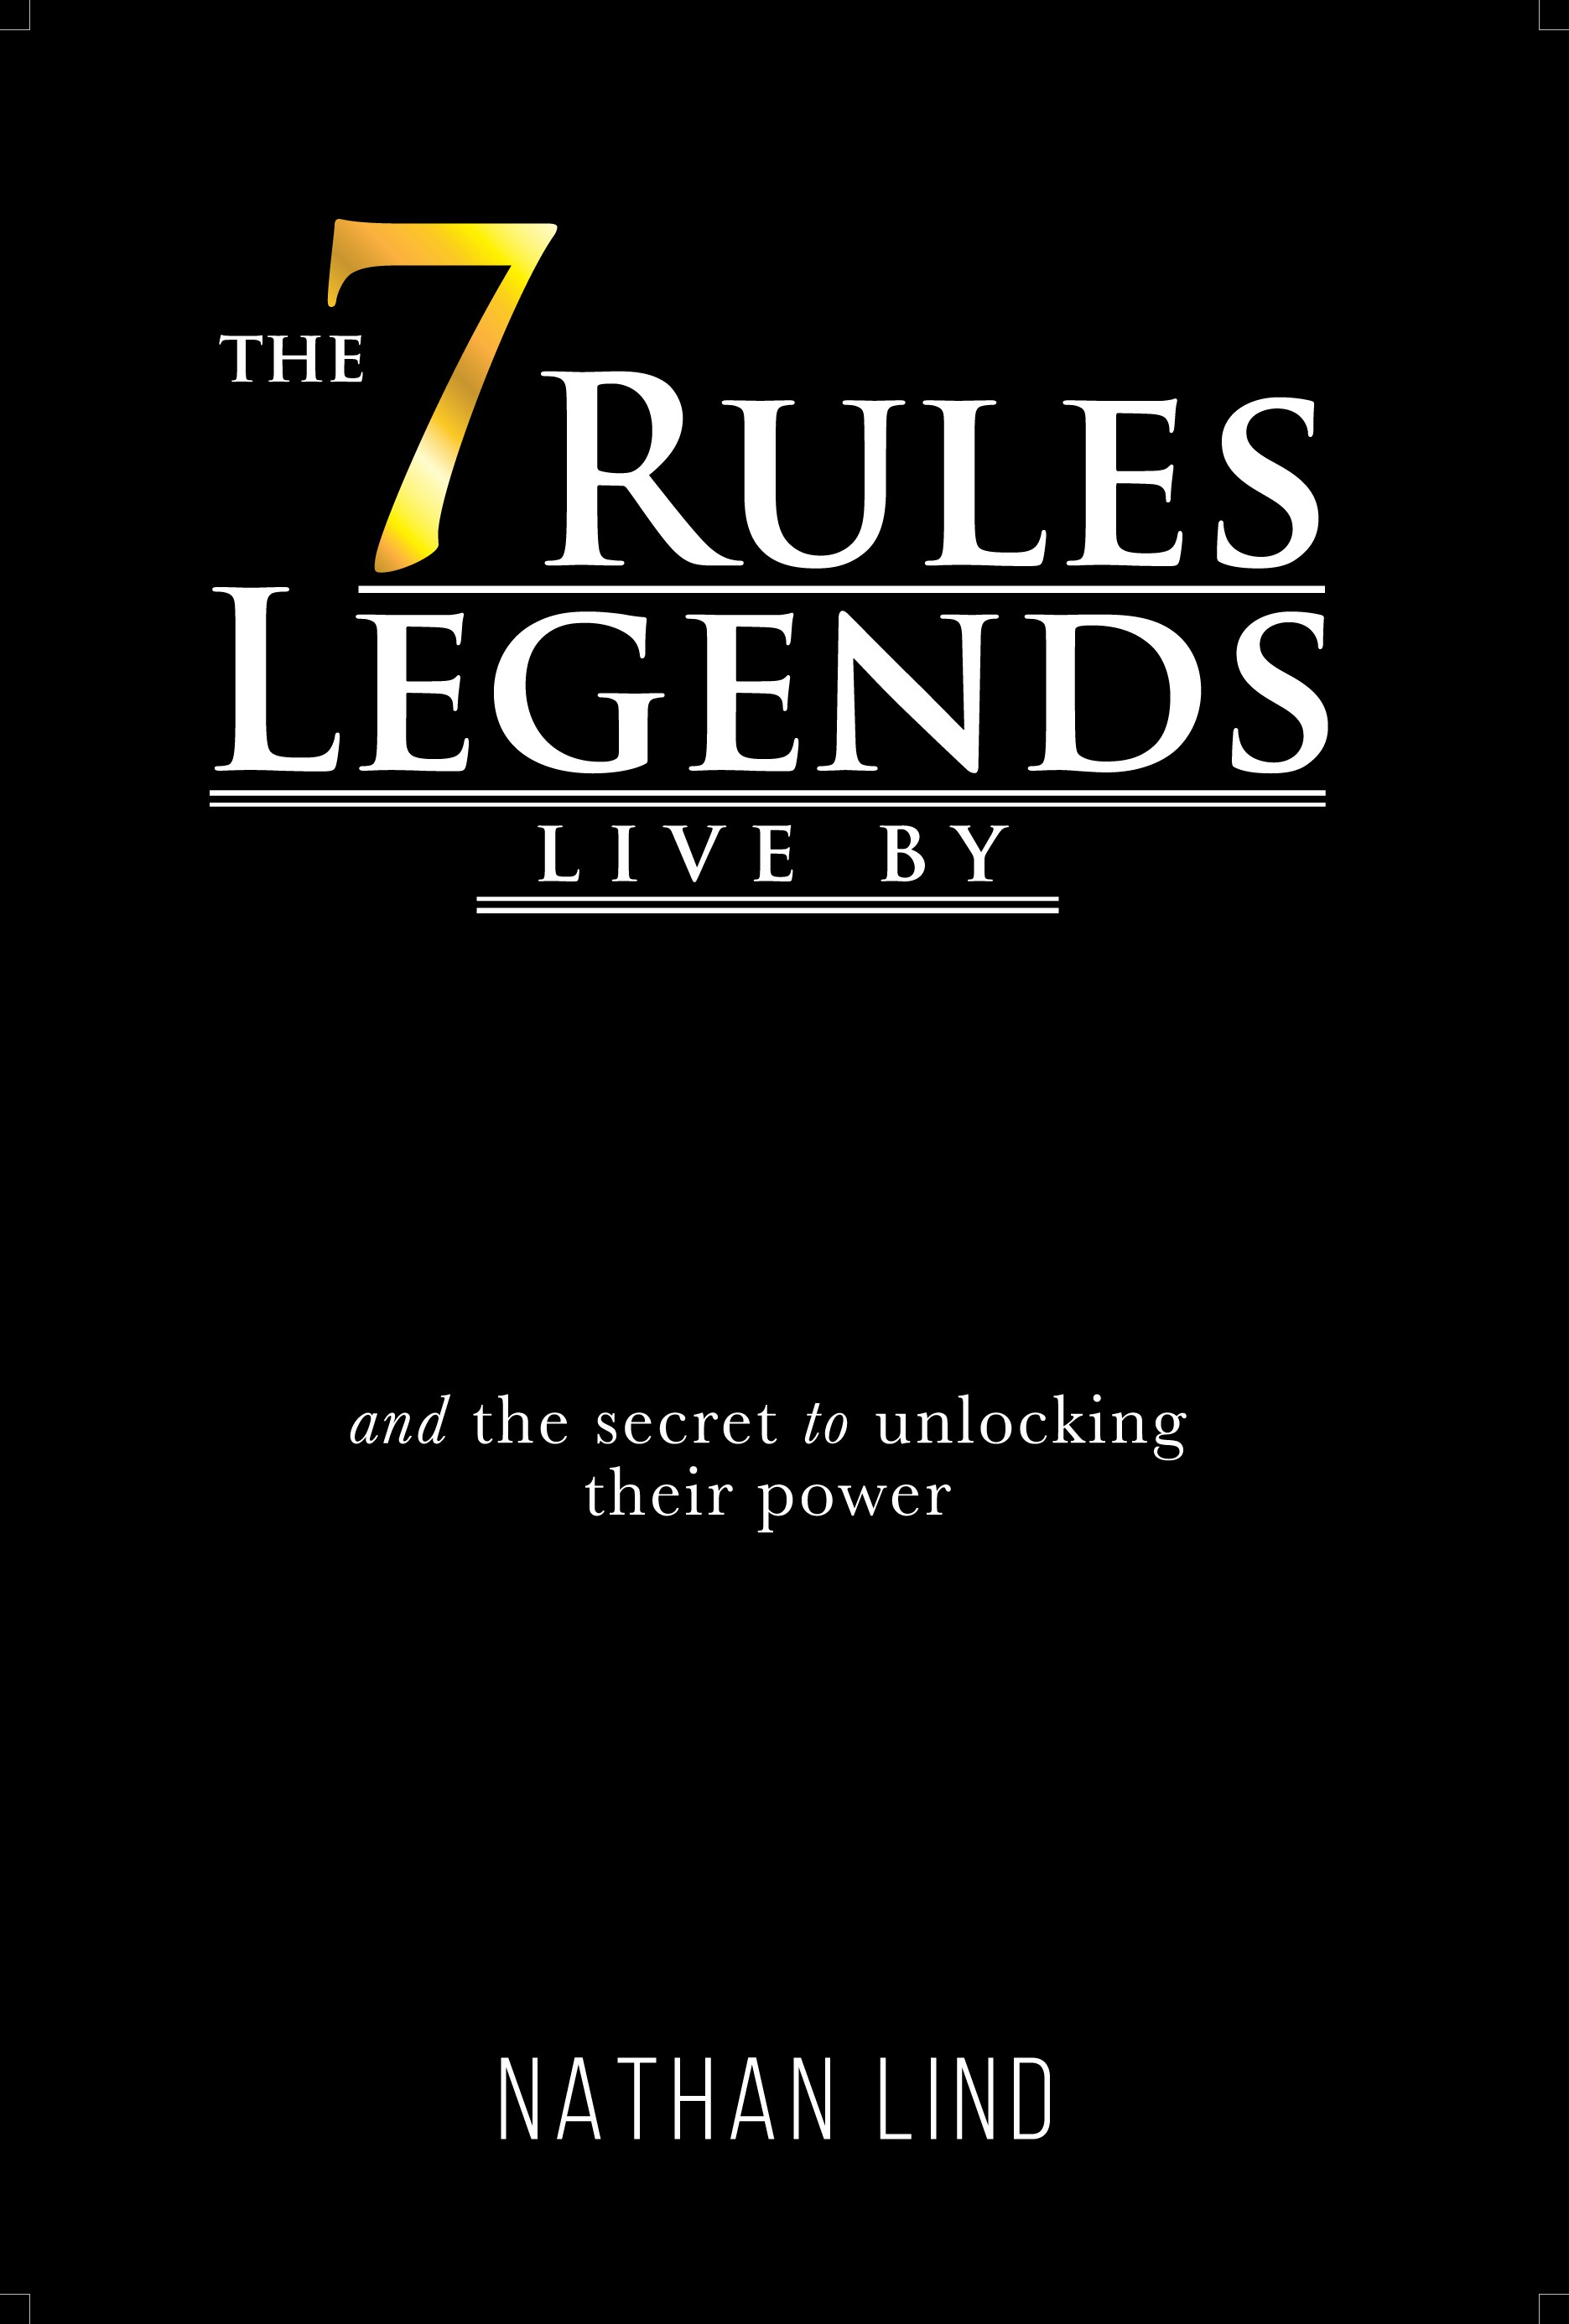 Book Title - LEGENDS